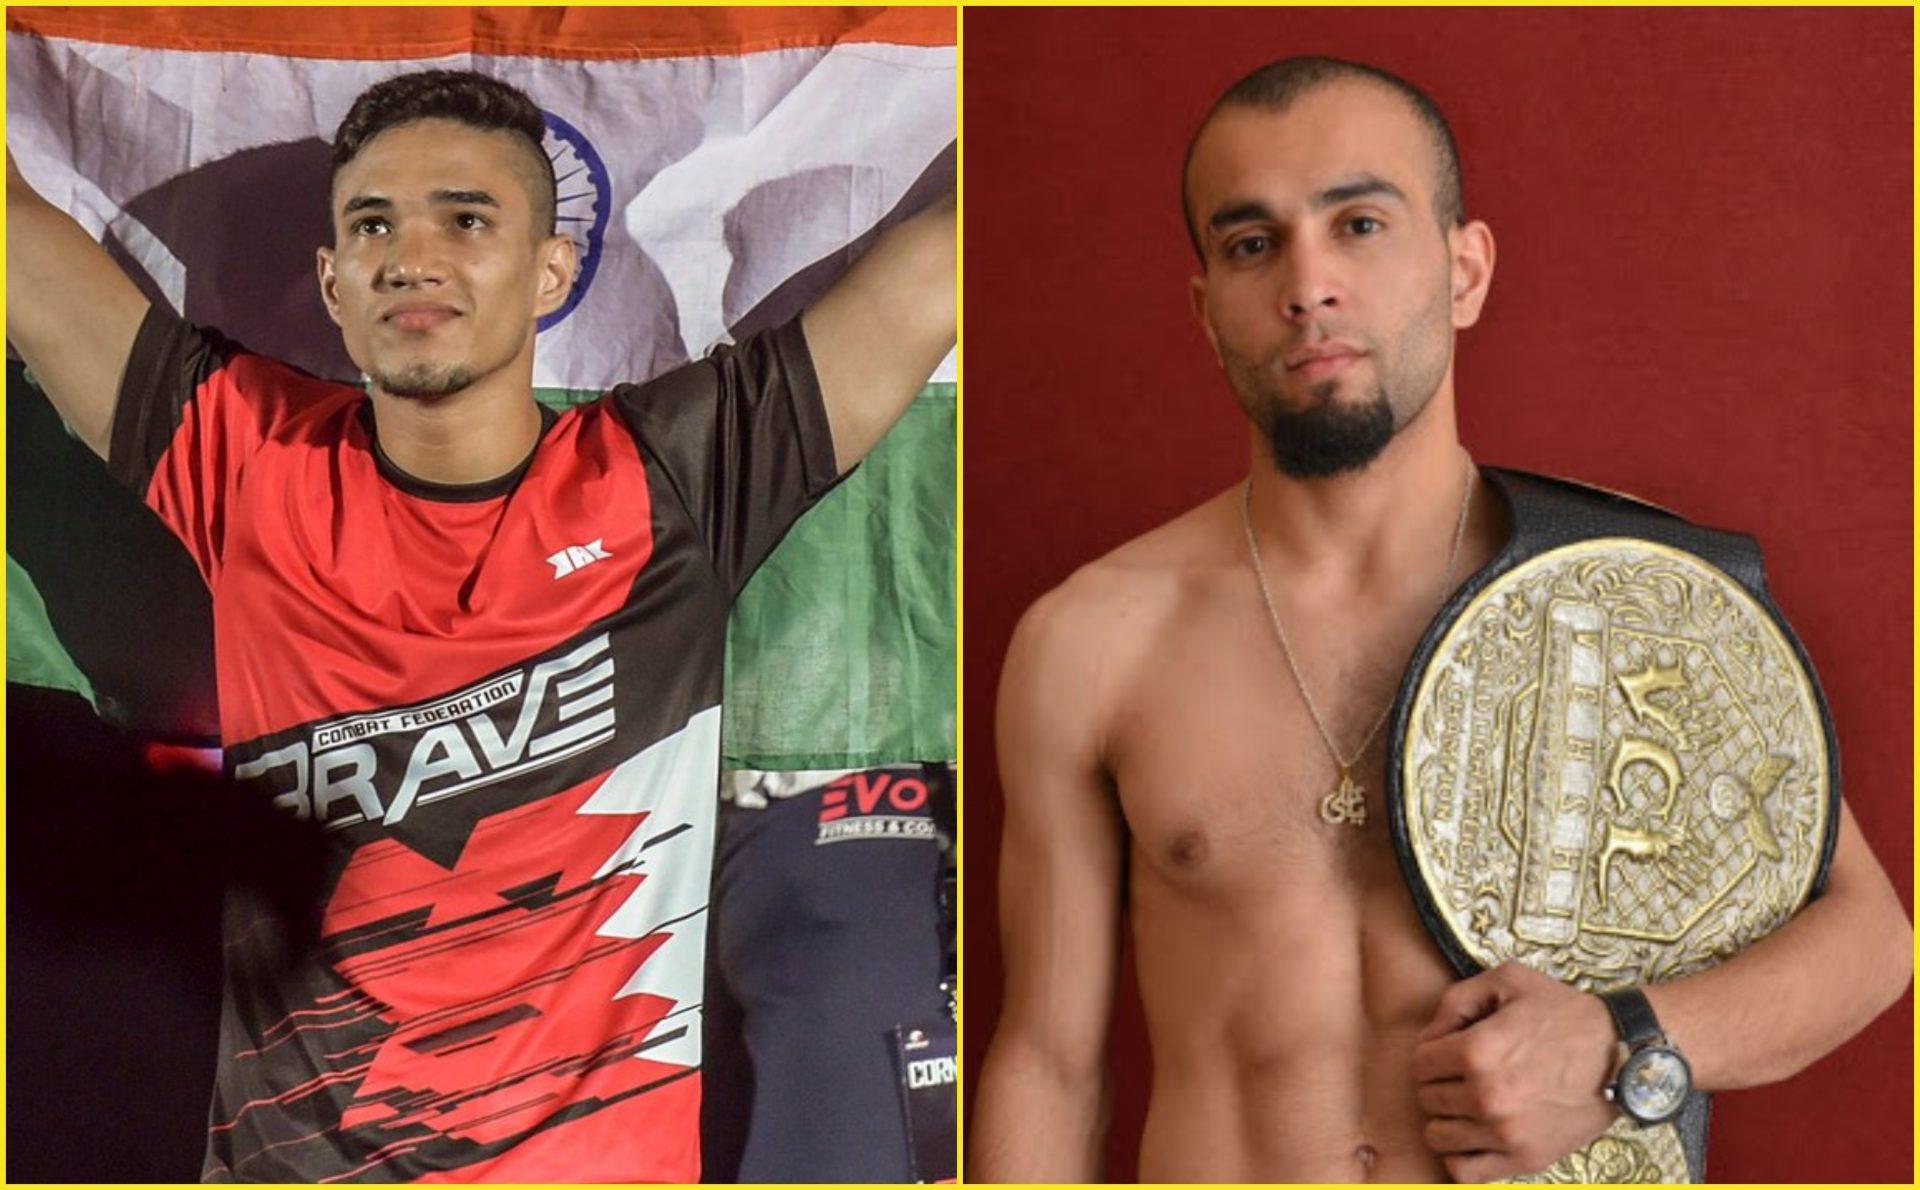 Mohammed Farhad is ready for three round war against Uloomi Karim - Mohammed Farhad